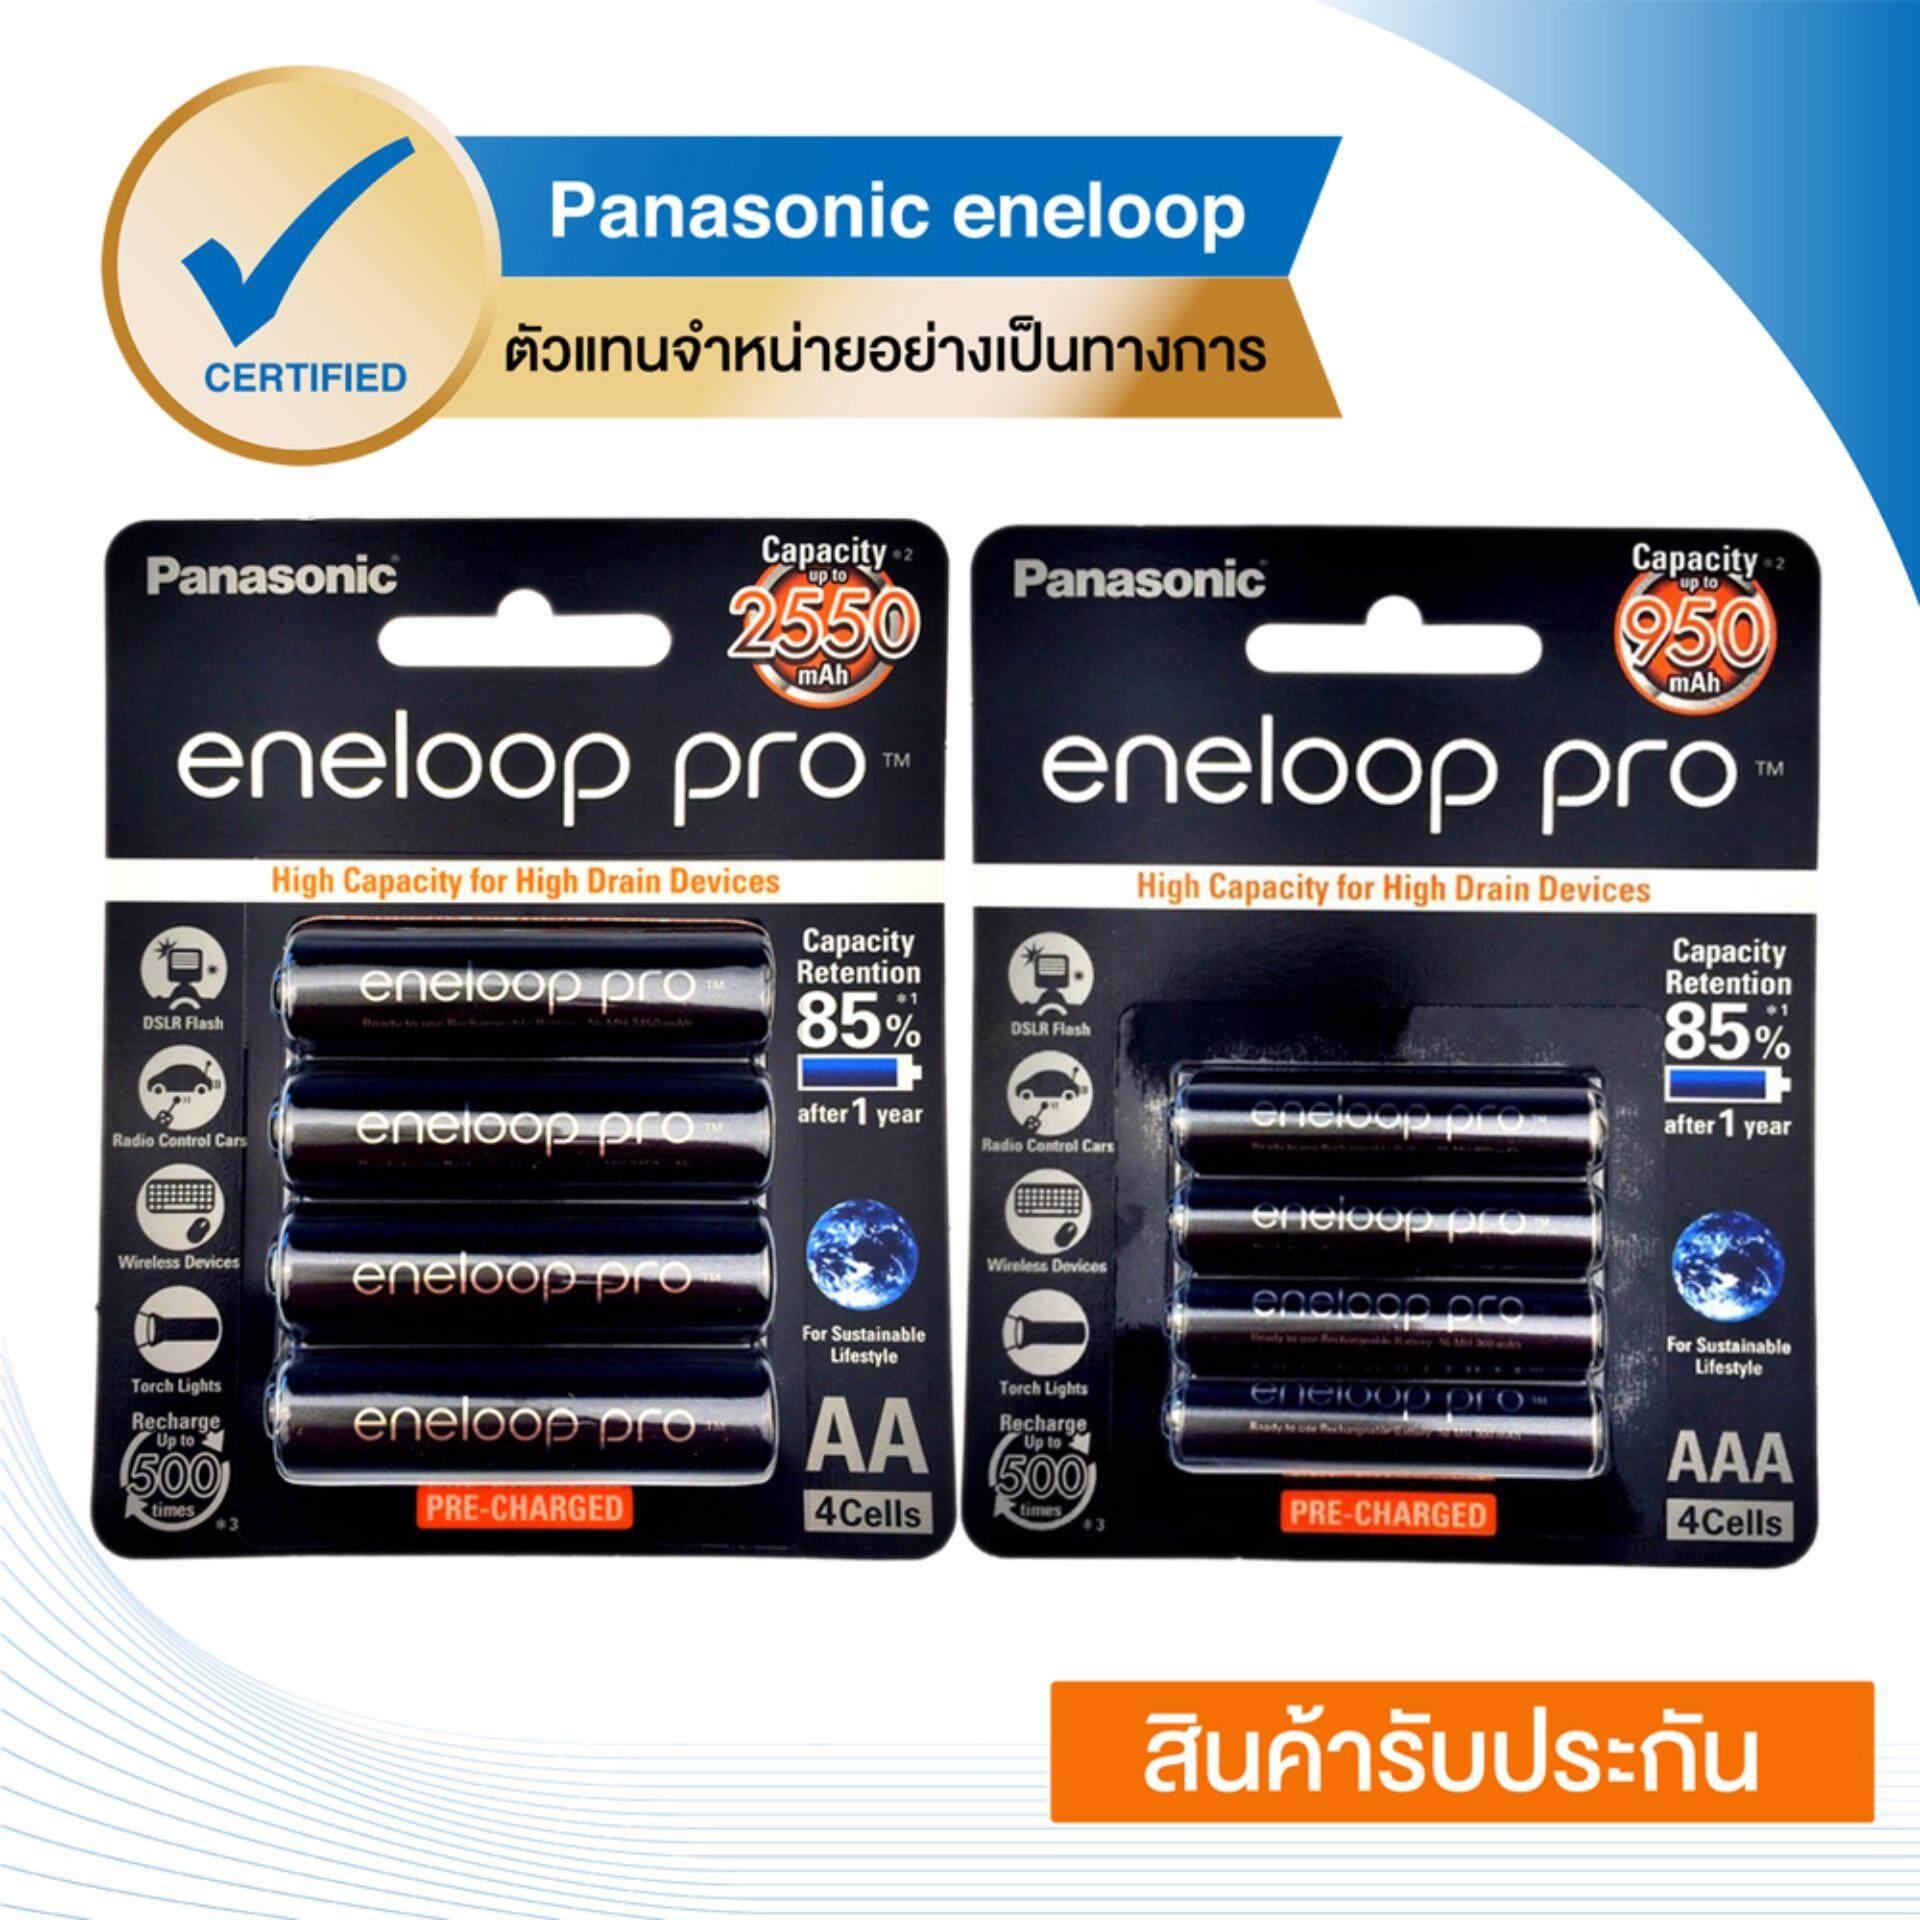 Eneloop Pro Rechargeable Battery ถ่านชาร์จ AA x 4pcs. AAA x 4pcs. -Black รุ่น BK-3HCCE/4BT + BK-4HCCE/4BT